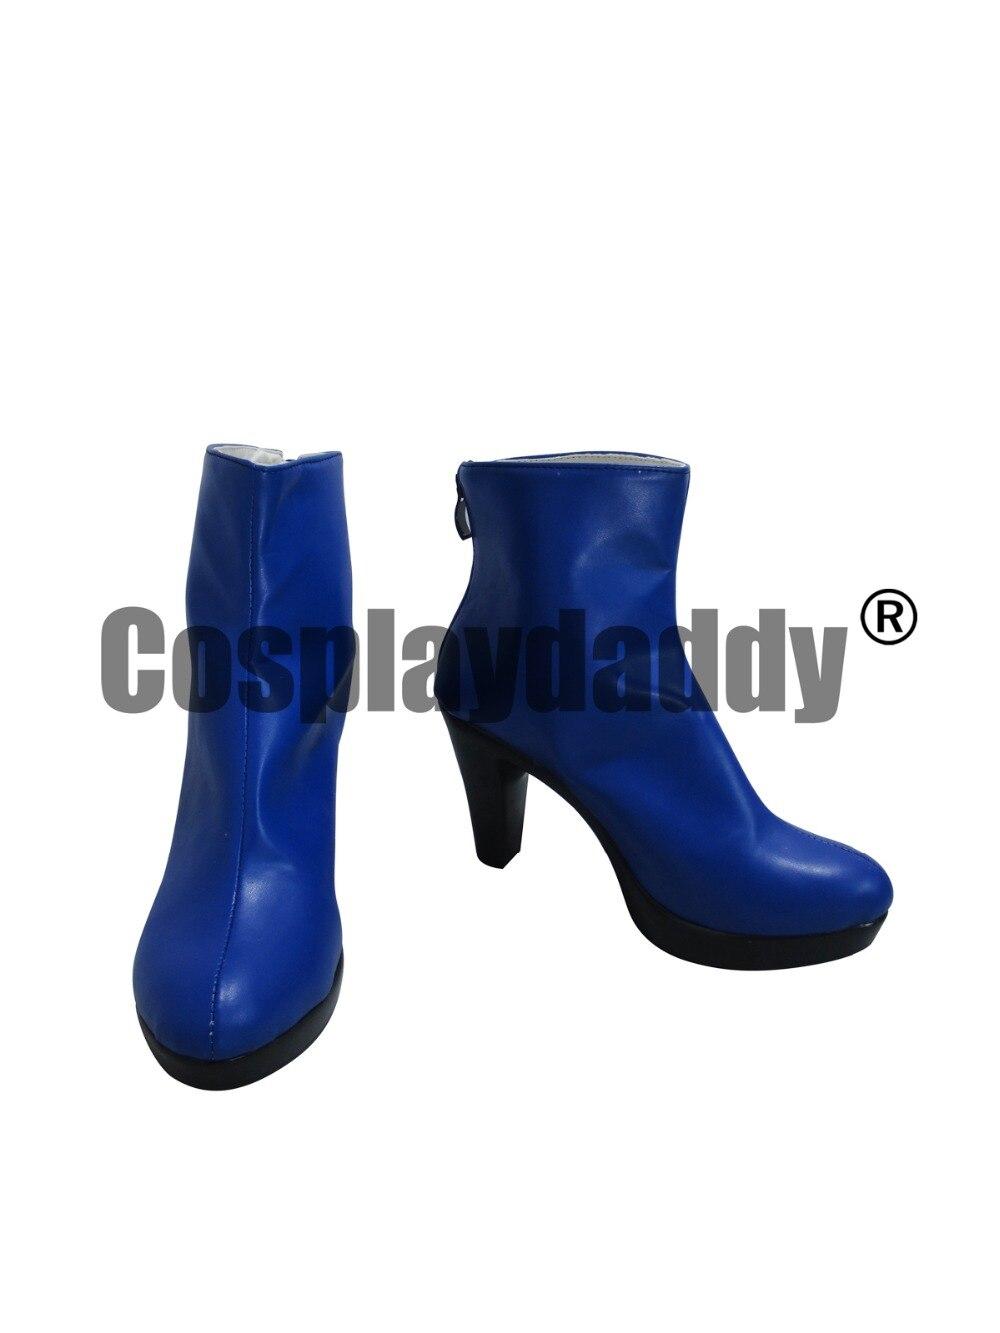 JOJO S Bizarre Adventure Jolyne Kujo Blue Halloween Short Shoes Boots H016